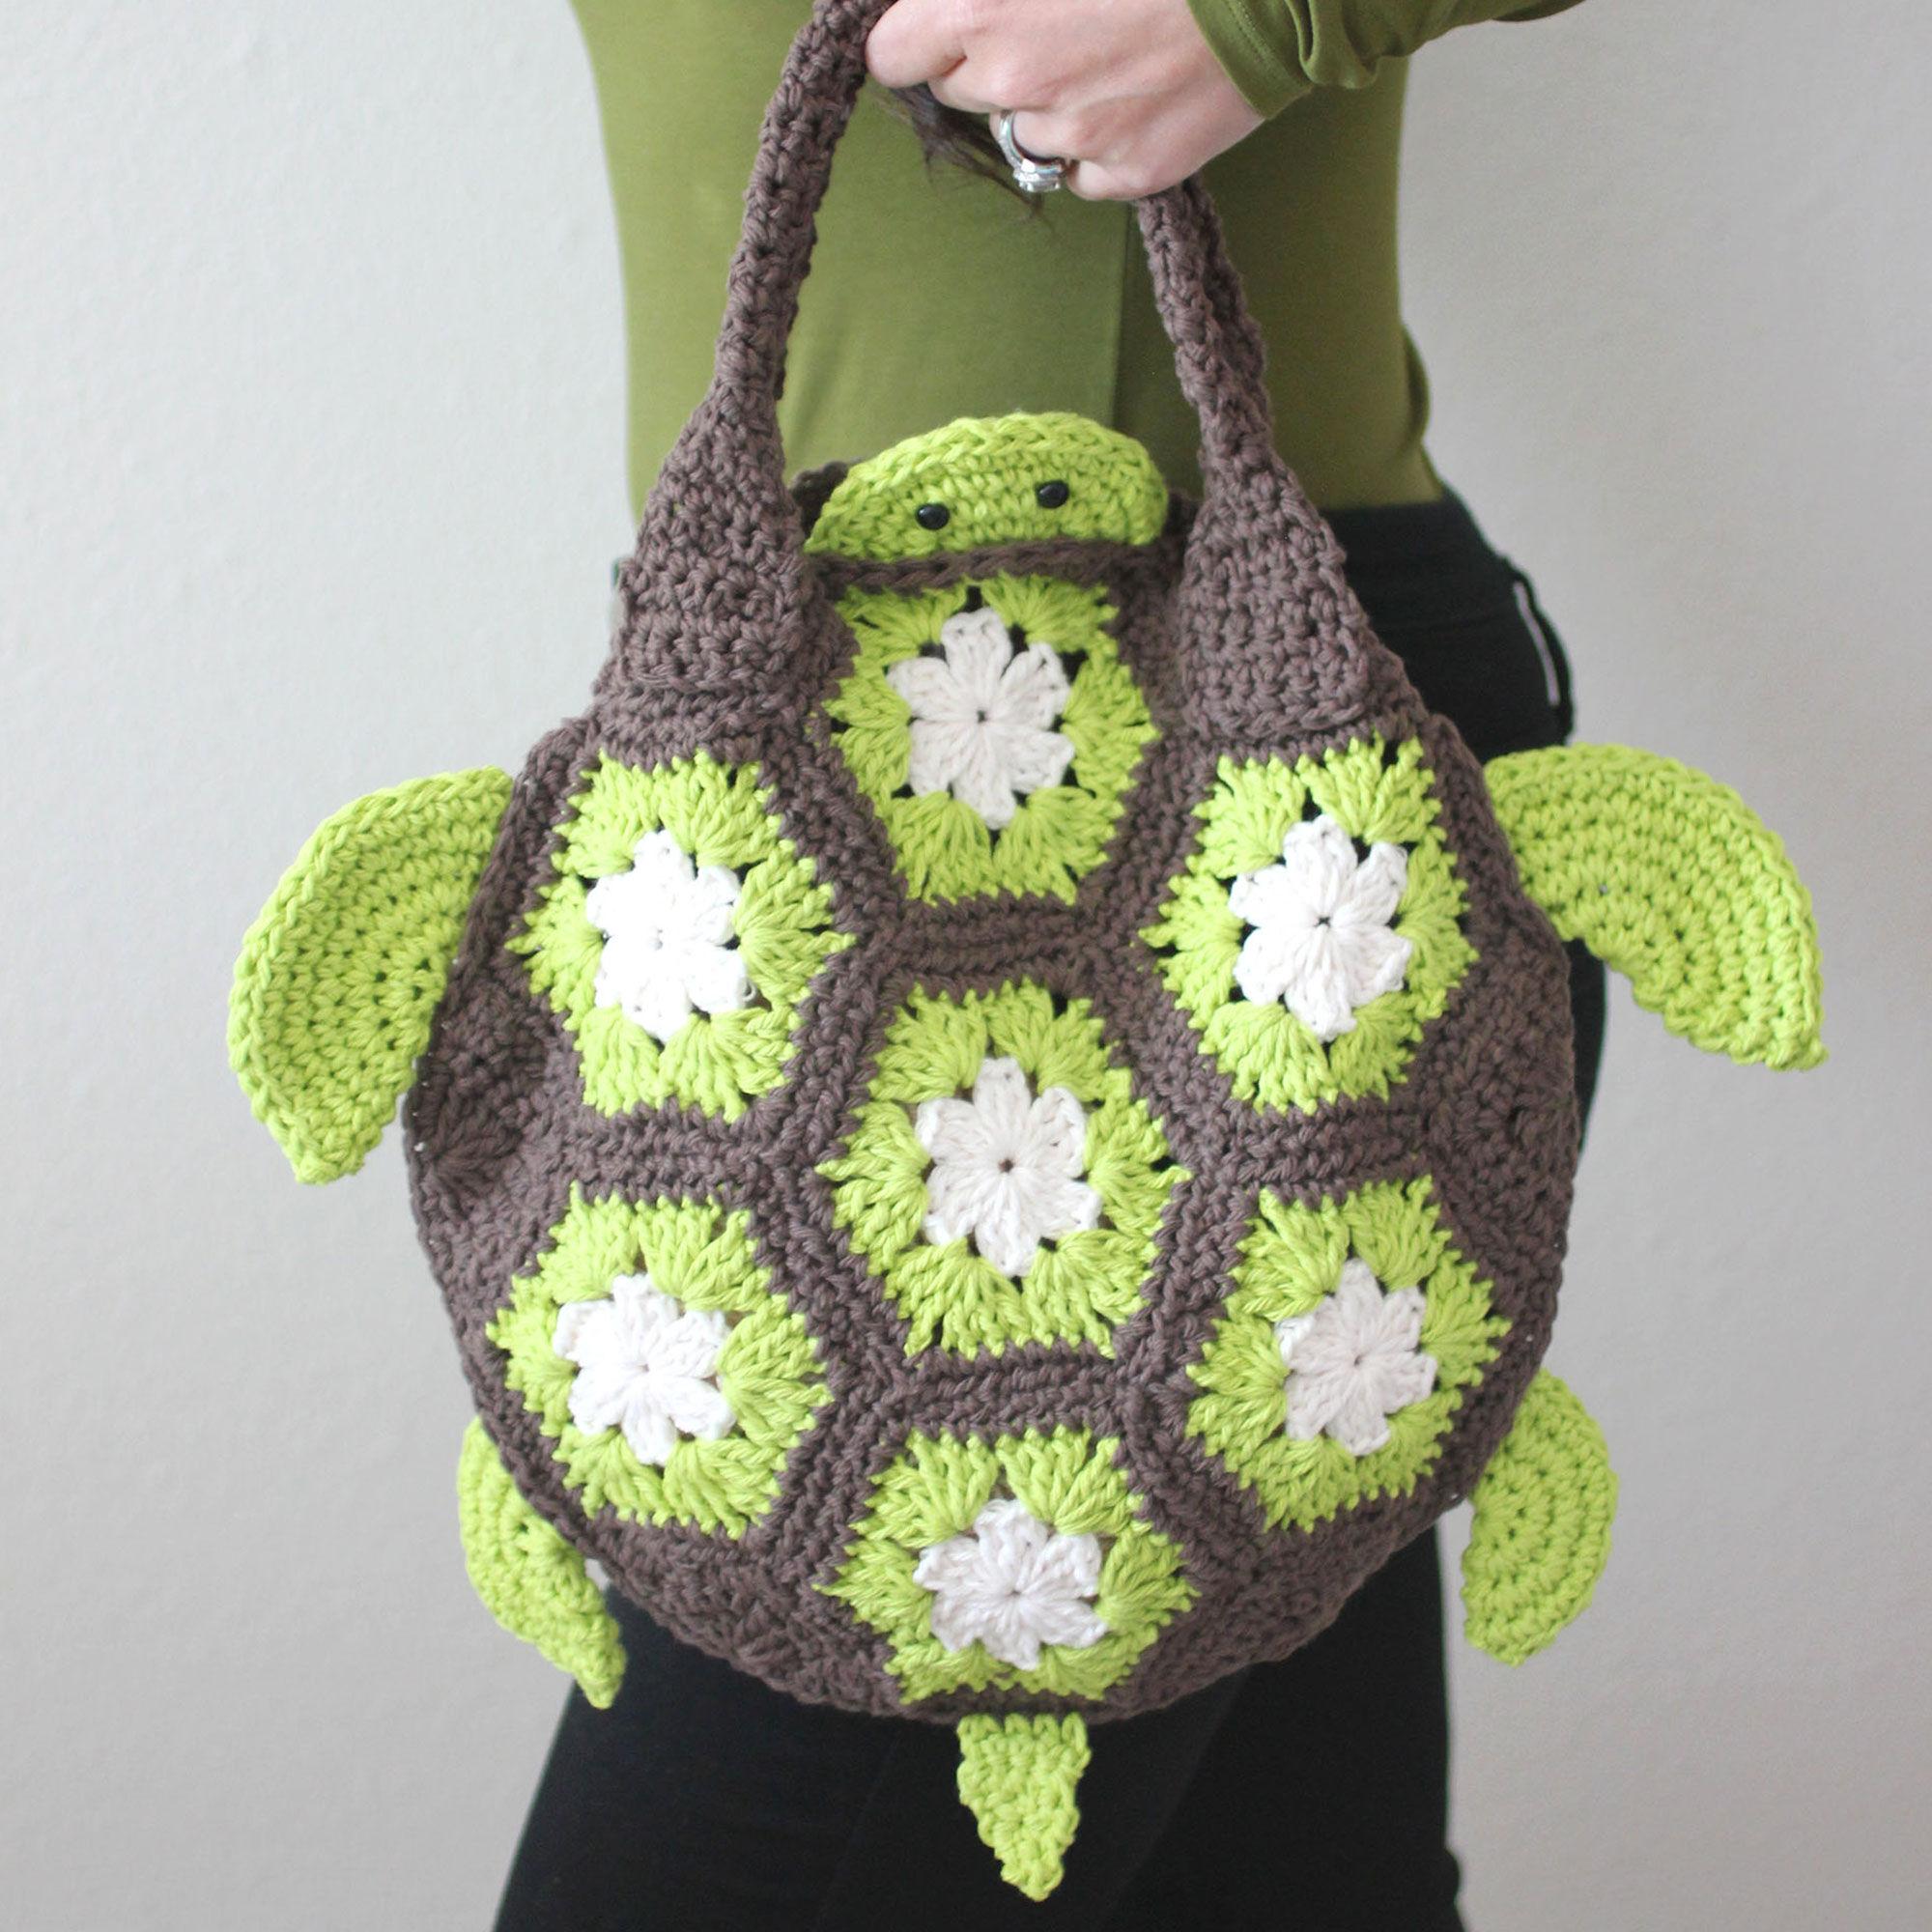 B Turtle Bag Hook-ZE283 Turtle Lover Bag Hook sea Turtle Purse Hook sea Turtle Jewelry Charm Purse Hook,Sea Turtles Bag Hook